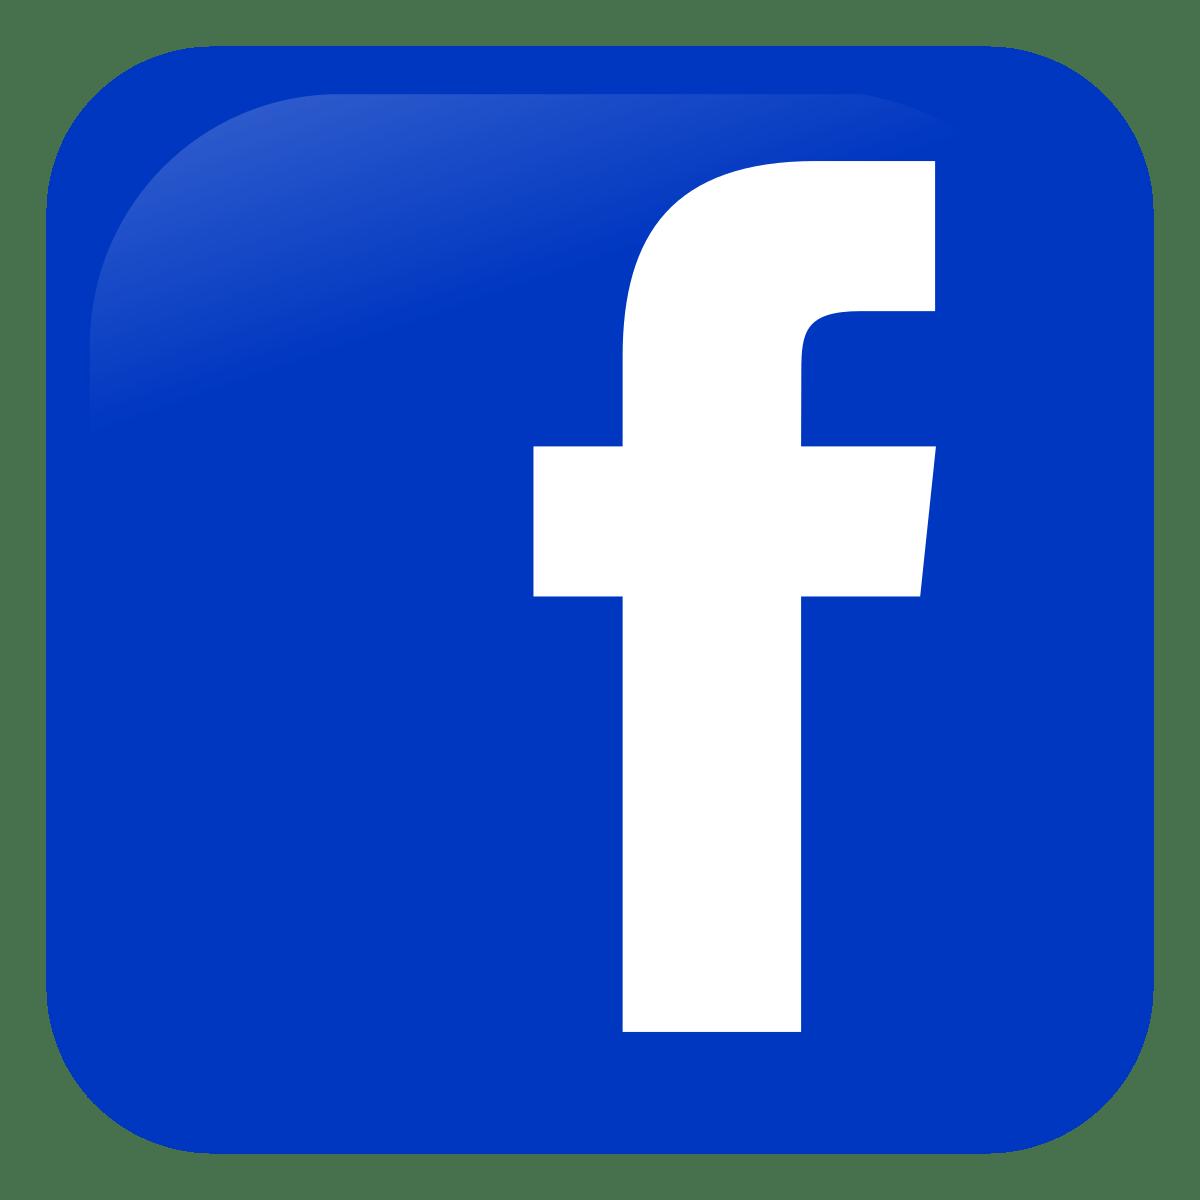 Follow Thunders Bakery on Facebook